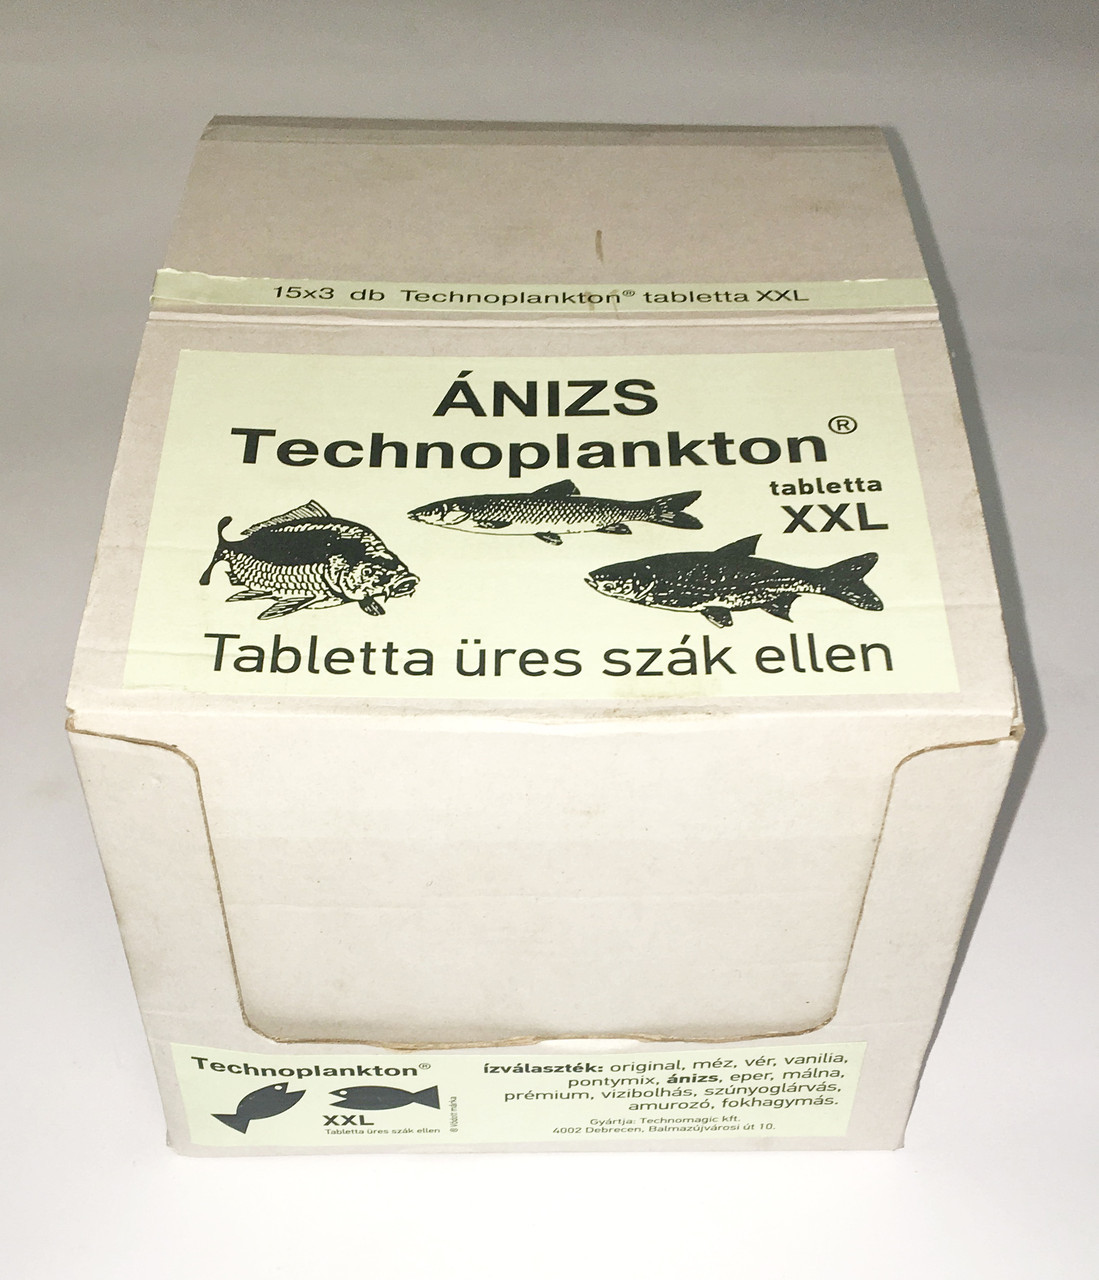 Технопланктон tabletta xxl ANIZS